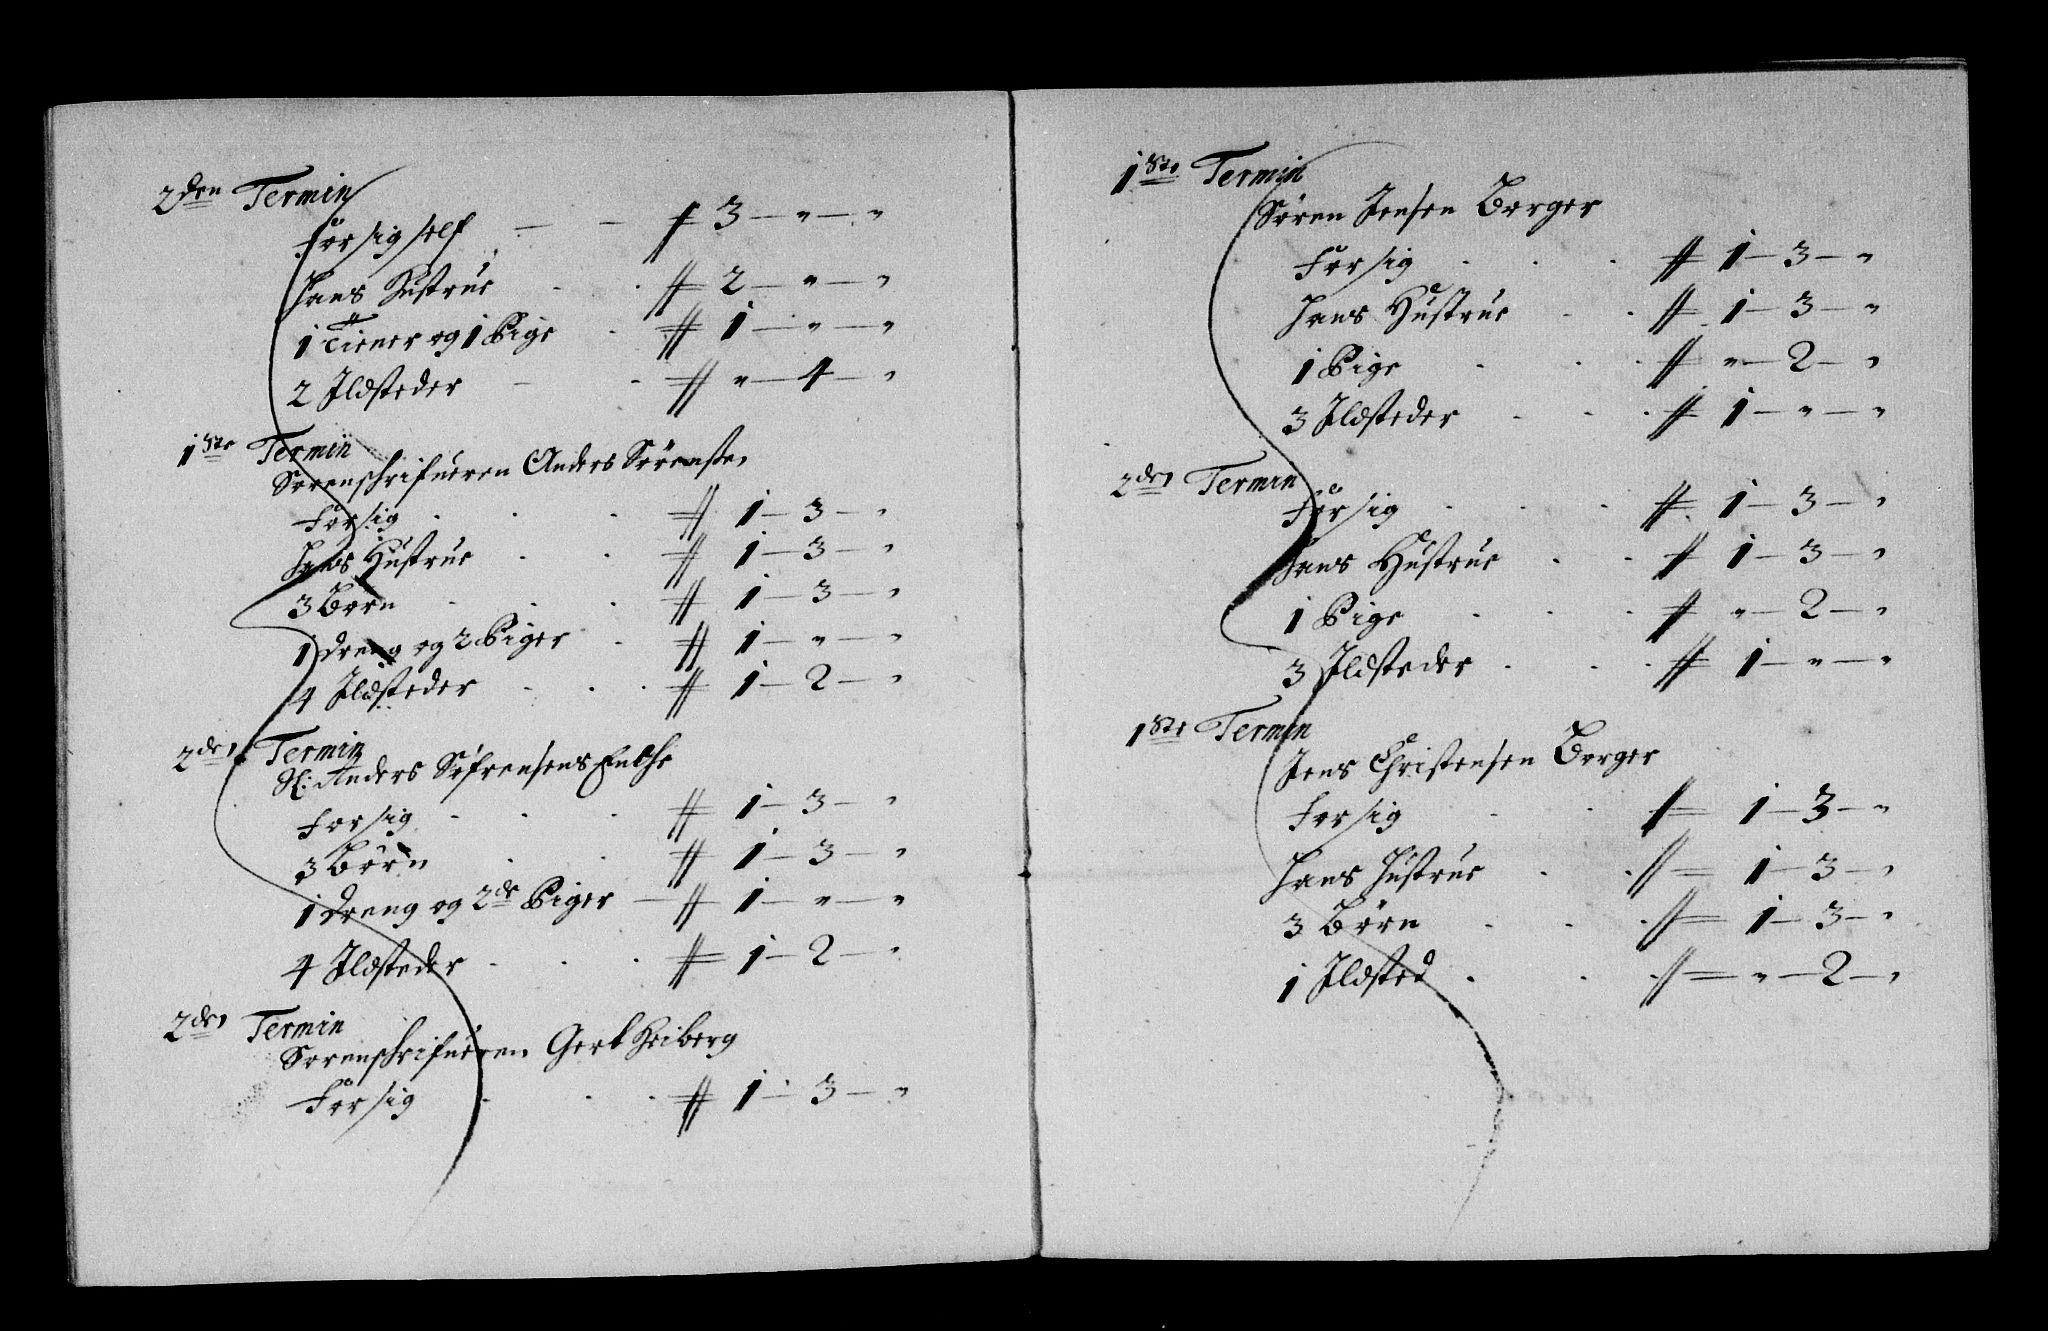 RA, Rentekammeret inntil 1814, Reviderte regnskaper, Stiftamtstueregnskaper, Bergen stiftamt, R/Rc/L0088: Bergen stiftamt, 1688